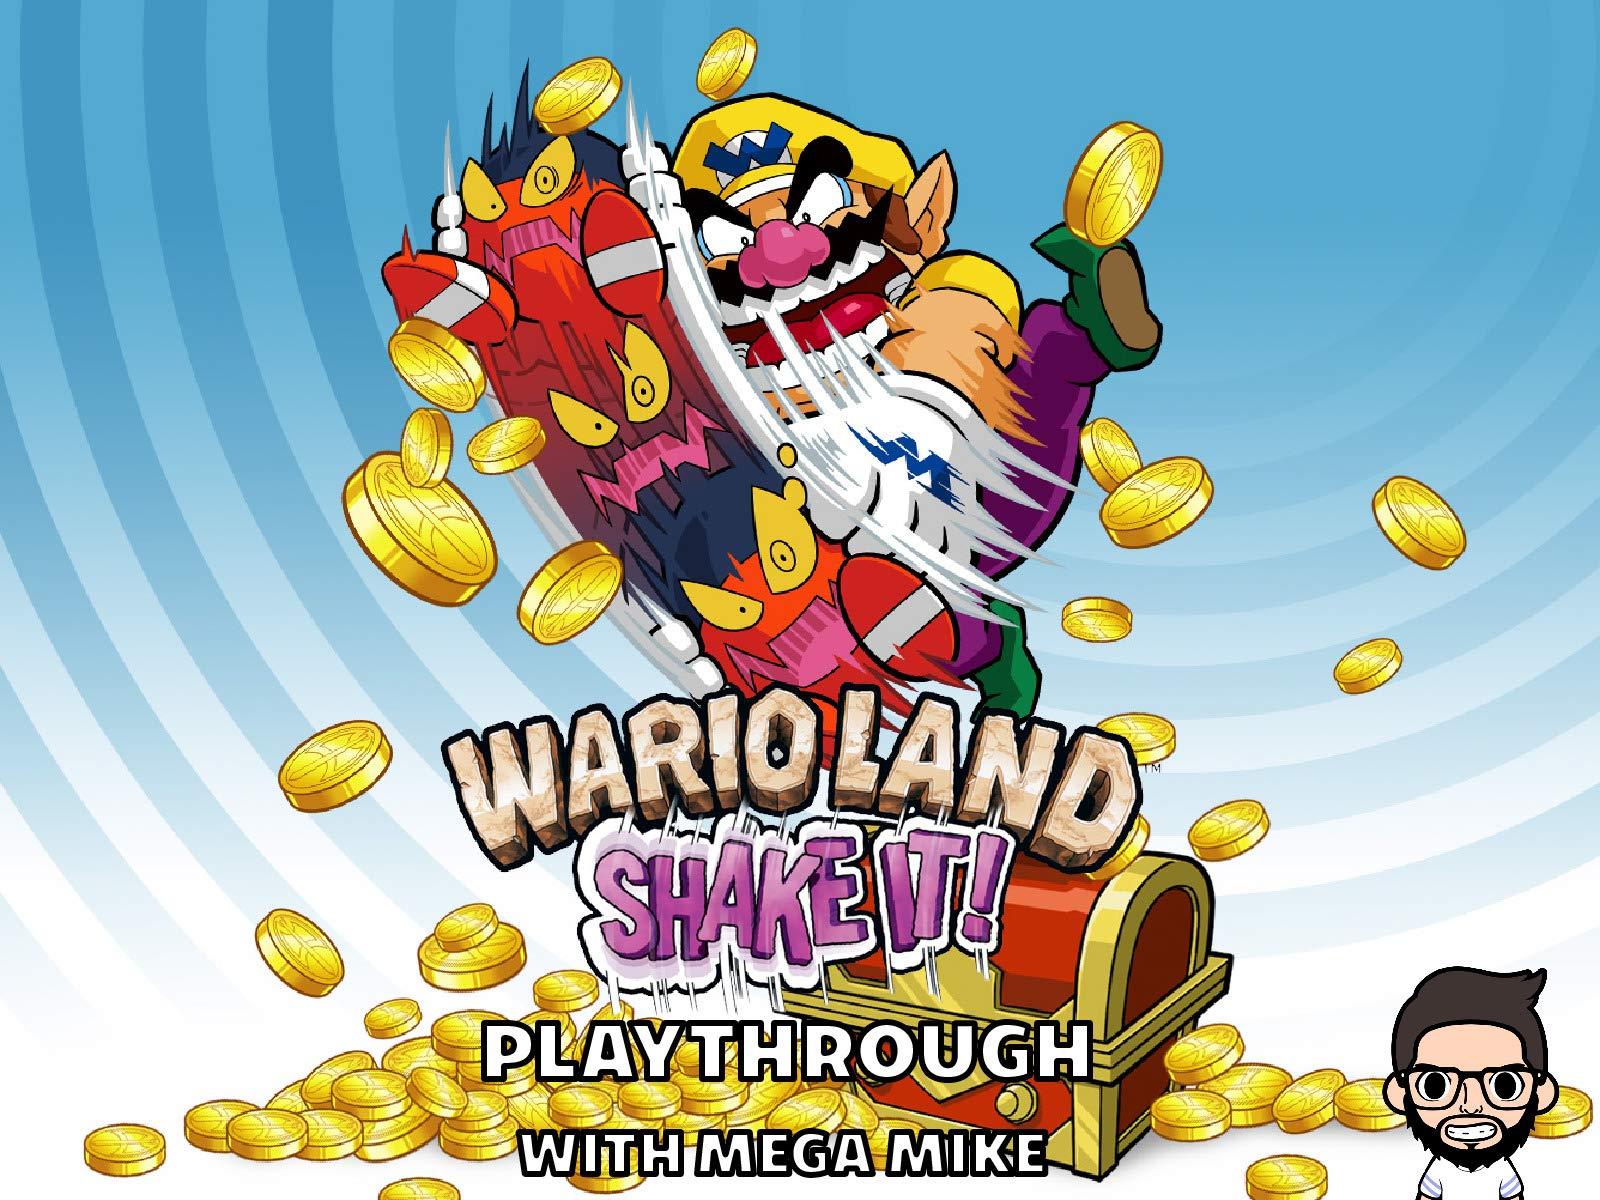 Wario Land Shake It Playthrough With Mega Mike - Season 1